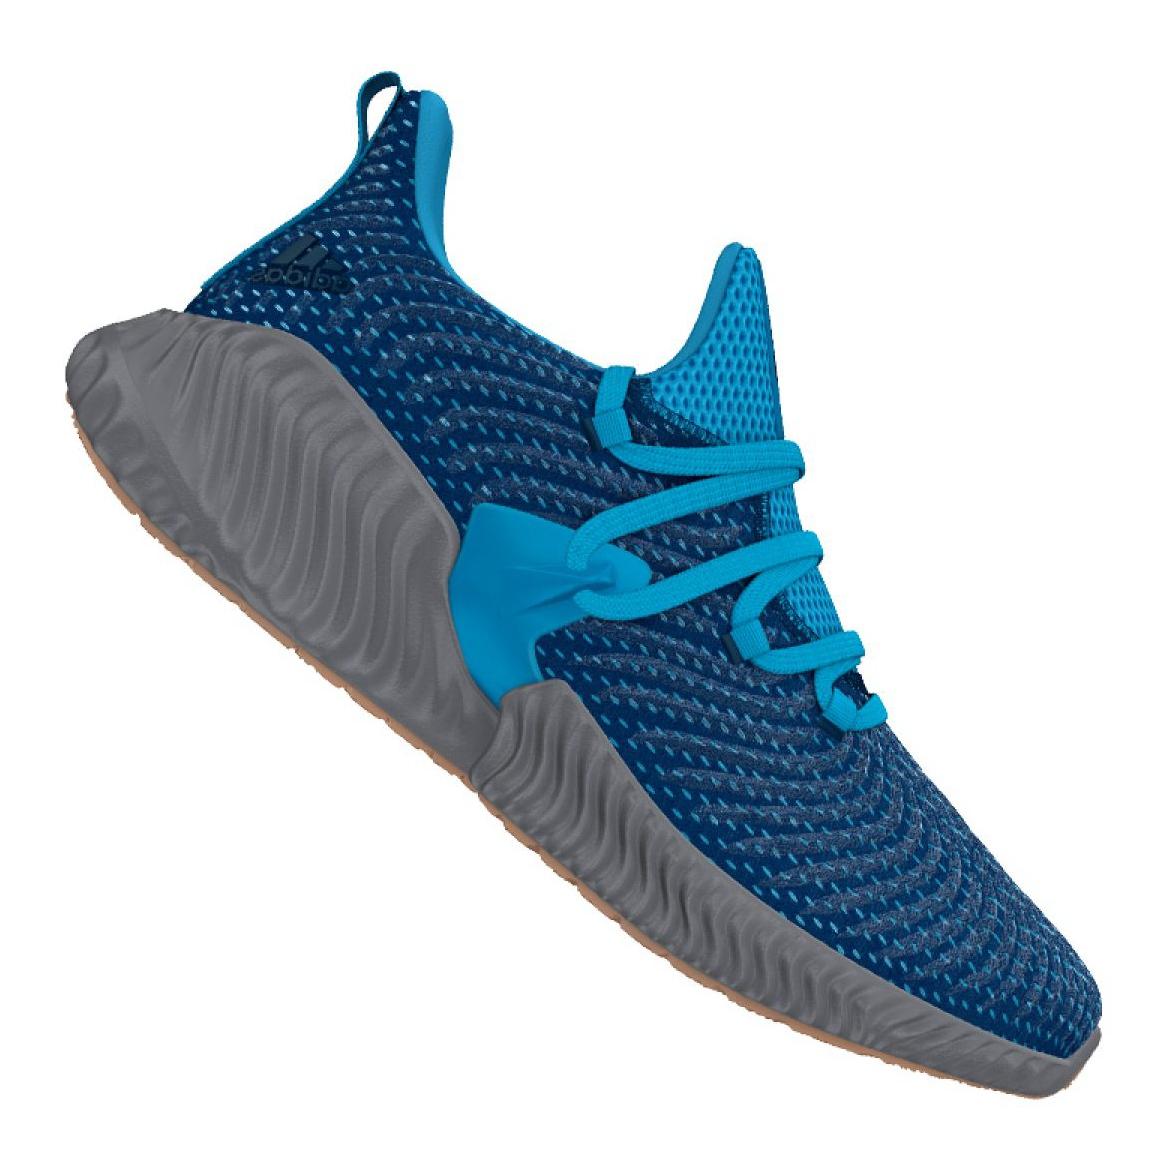 Soldes > adidas alphabounce instinct blue > en stock